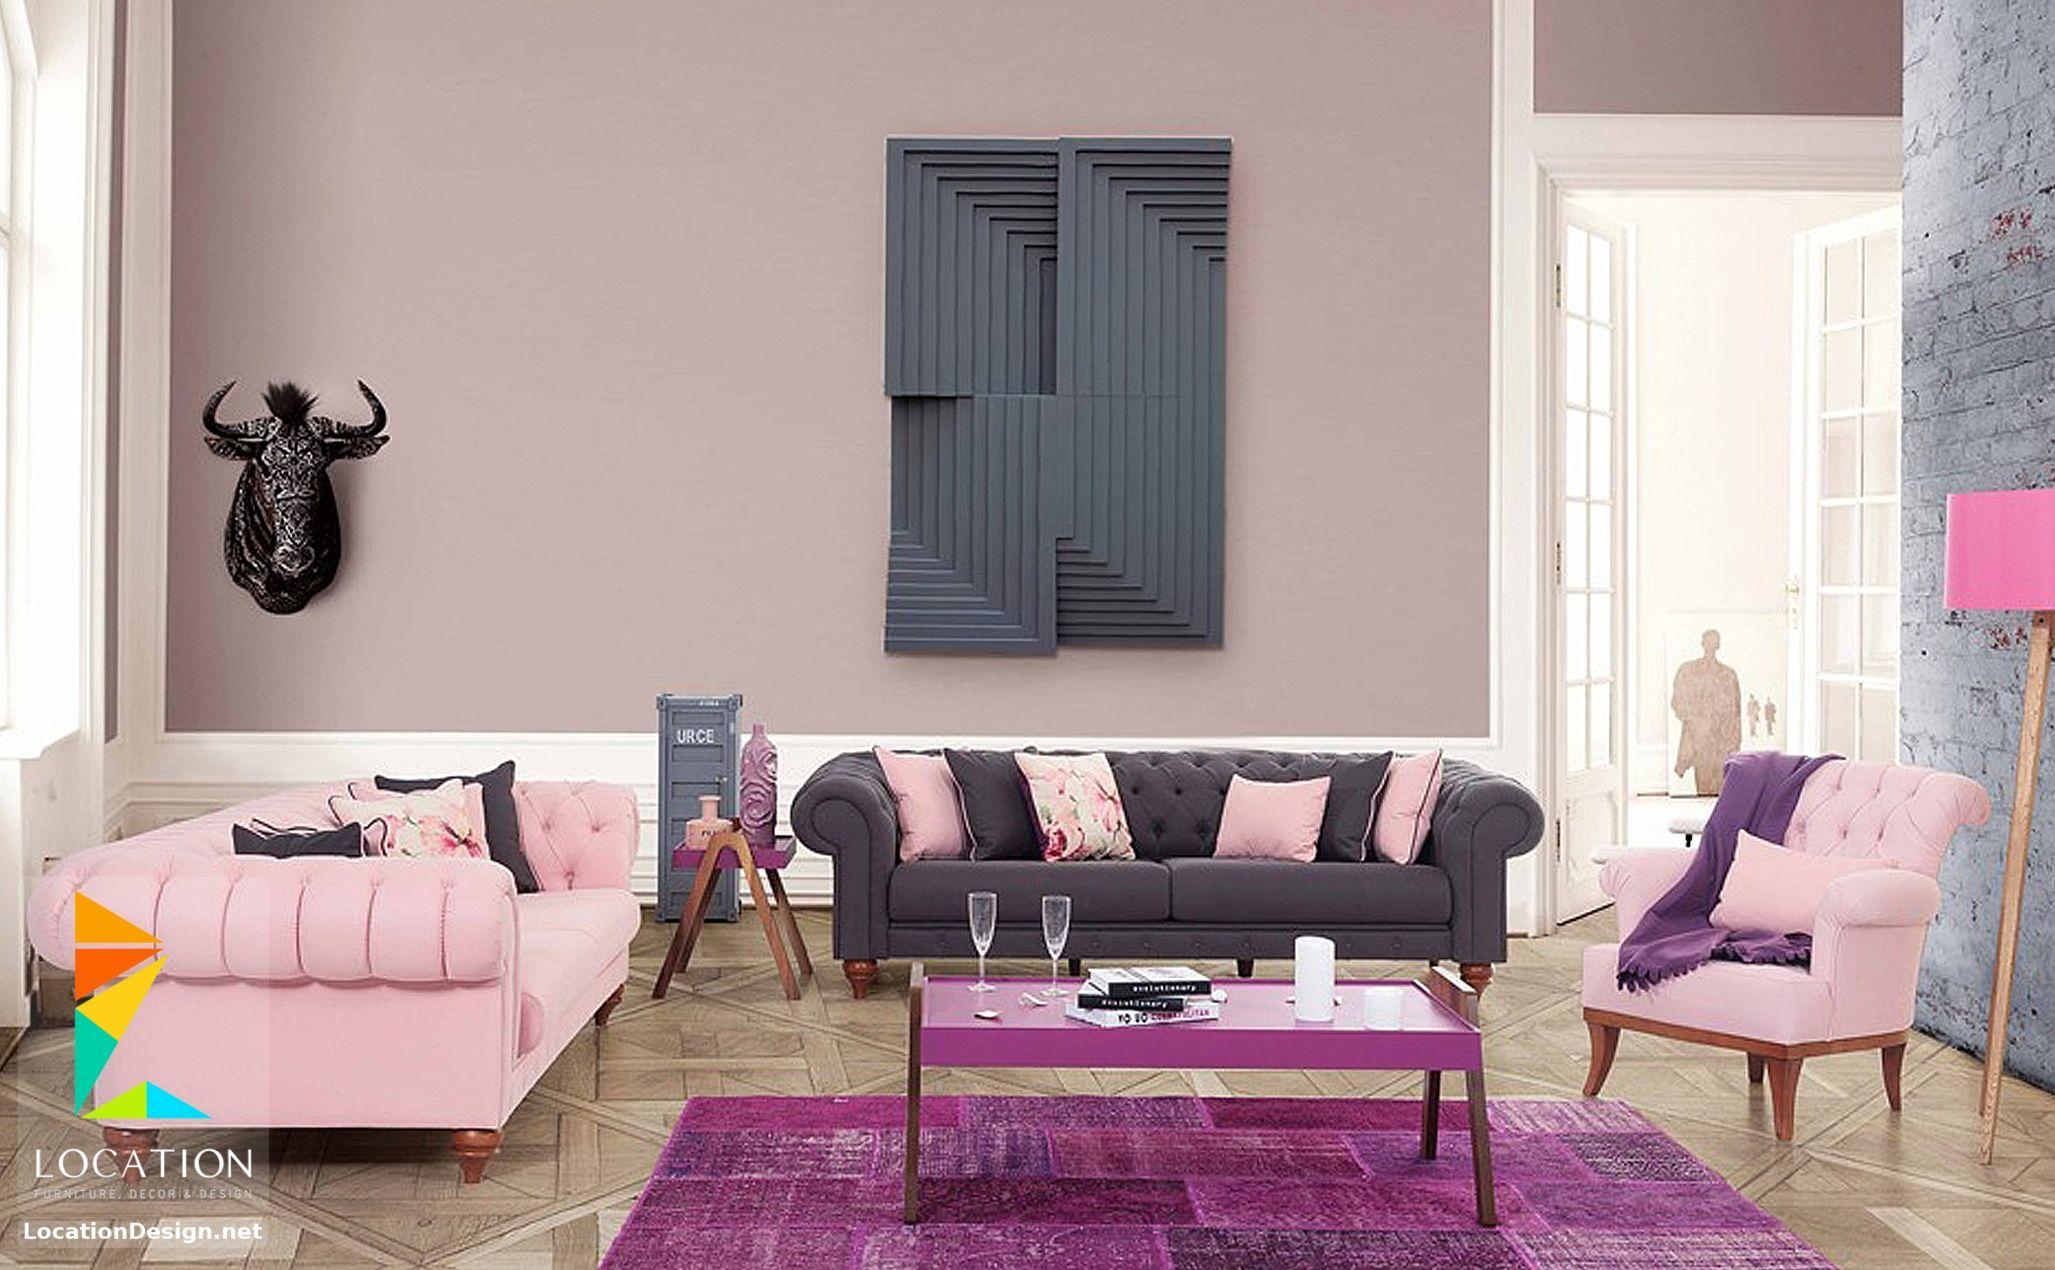 اجمل موديلات انتريهات مودرن من احدث كتالوج صور واشكال الانتريهات المودرن 2019 2020 Furniture Romantic Living Room Home Decor